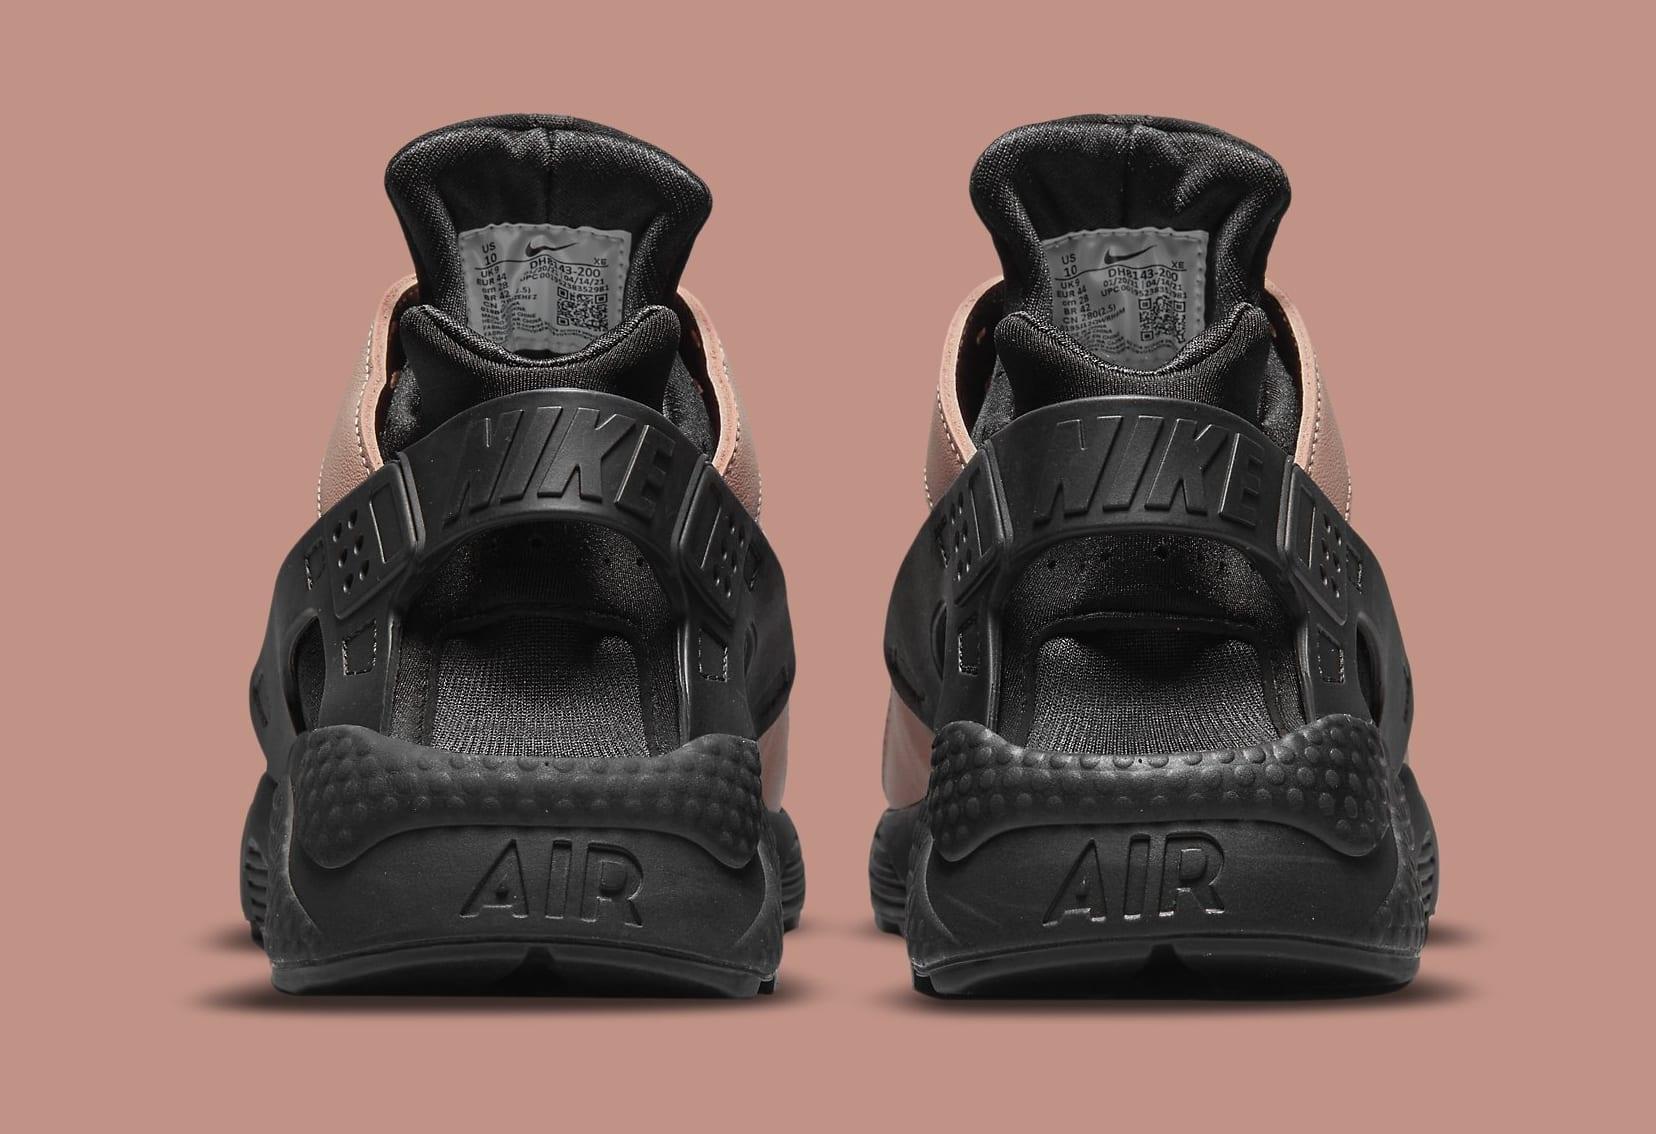 Nike Air Huarache 'Toadstool' DH8143-200 Heel